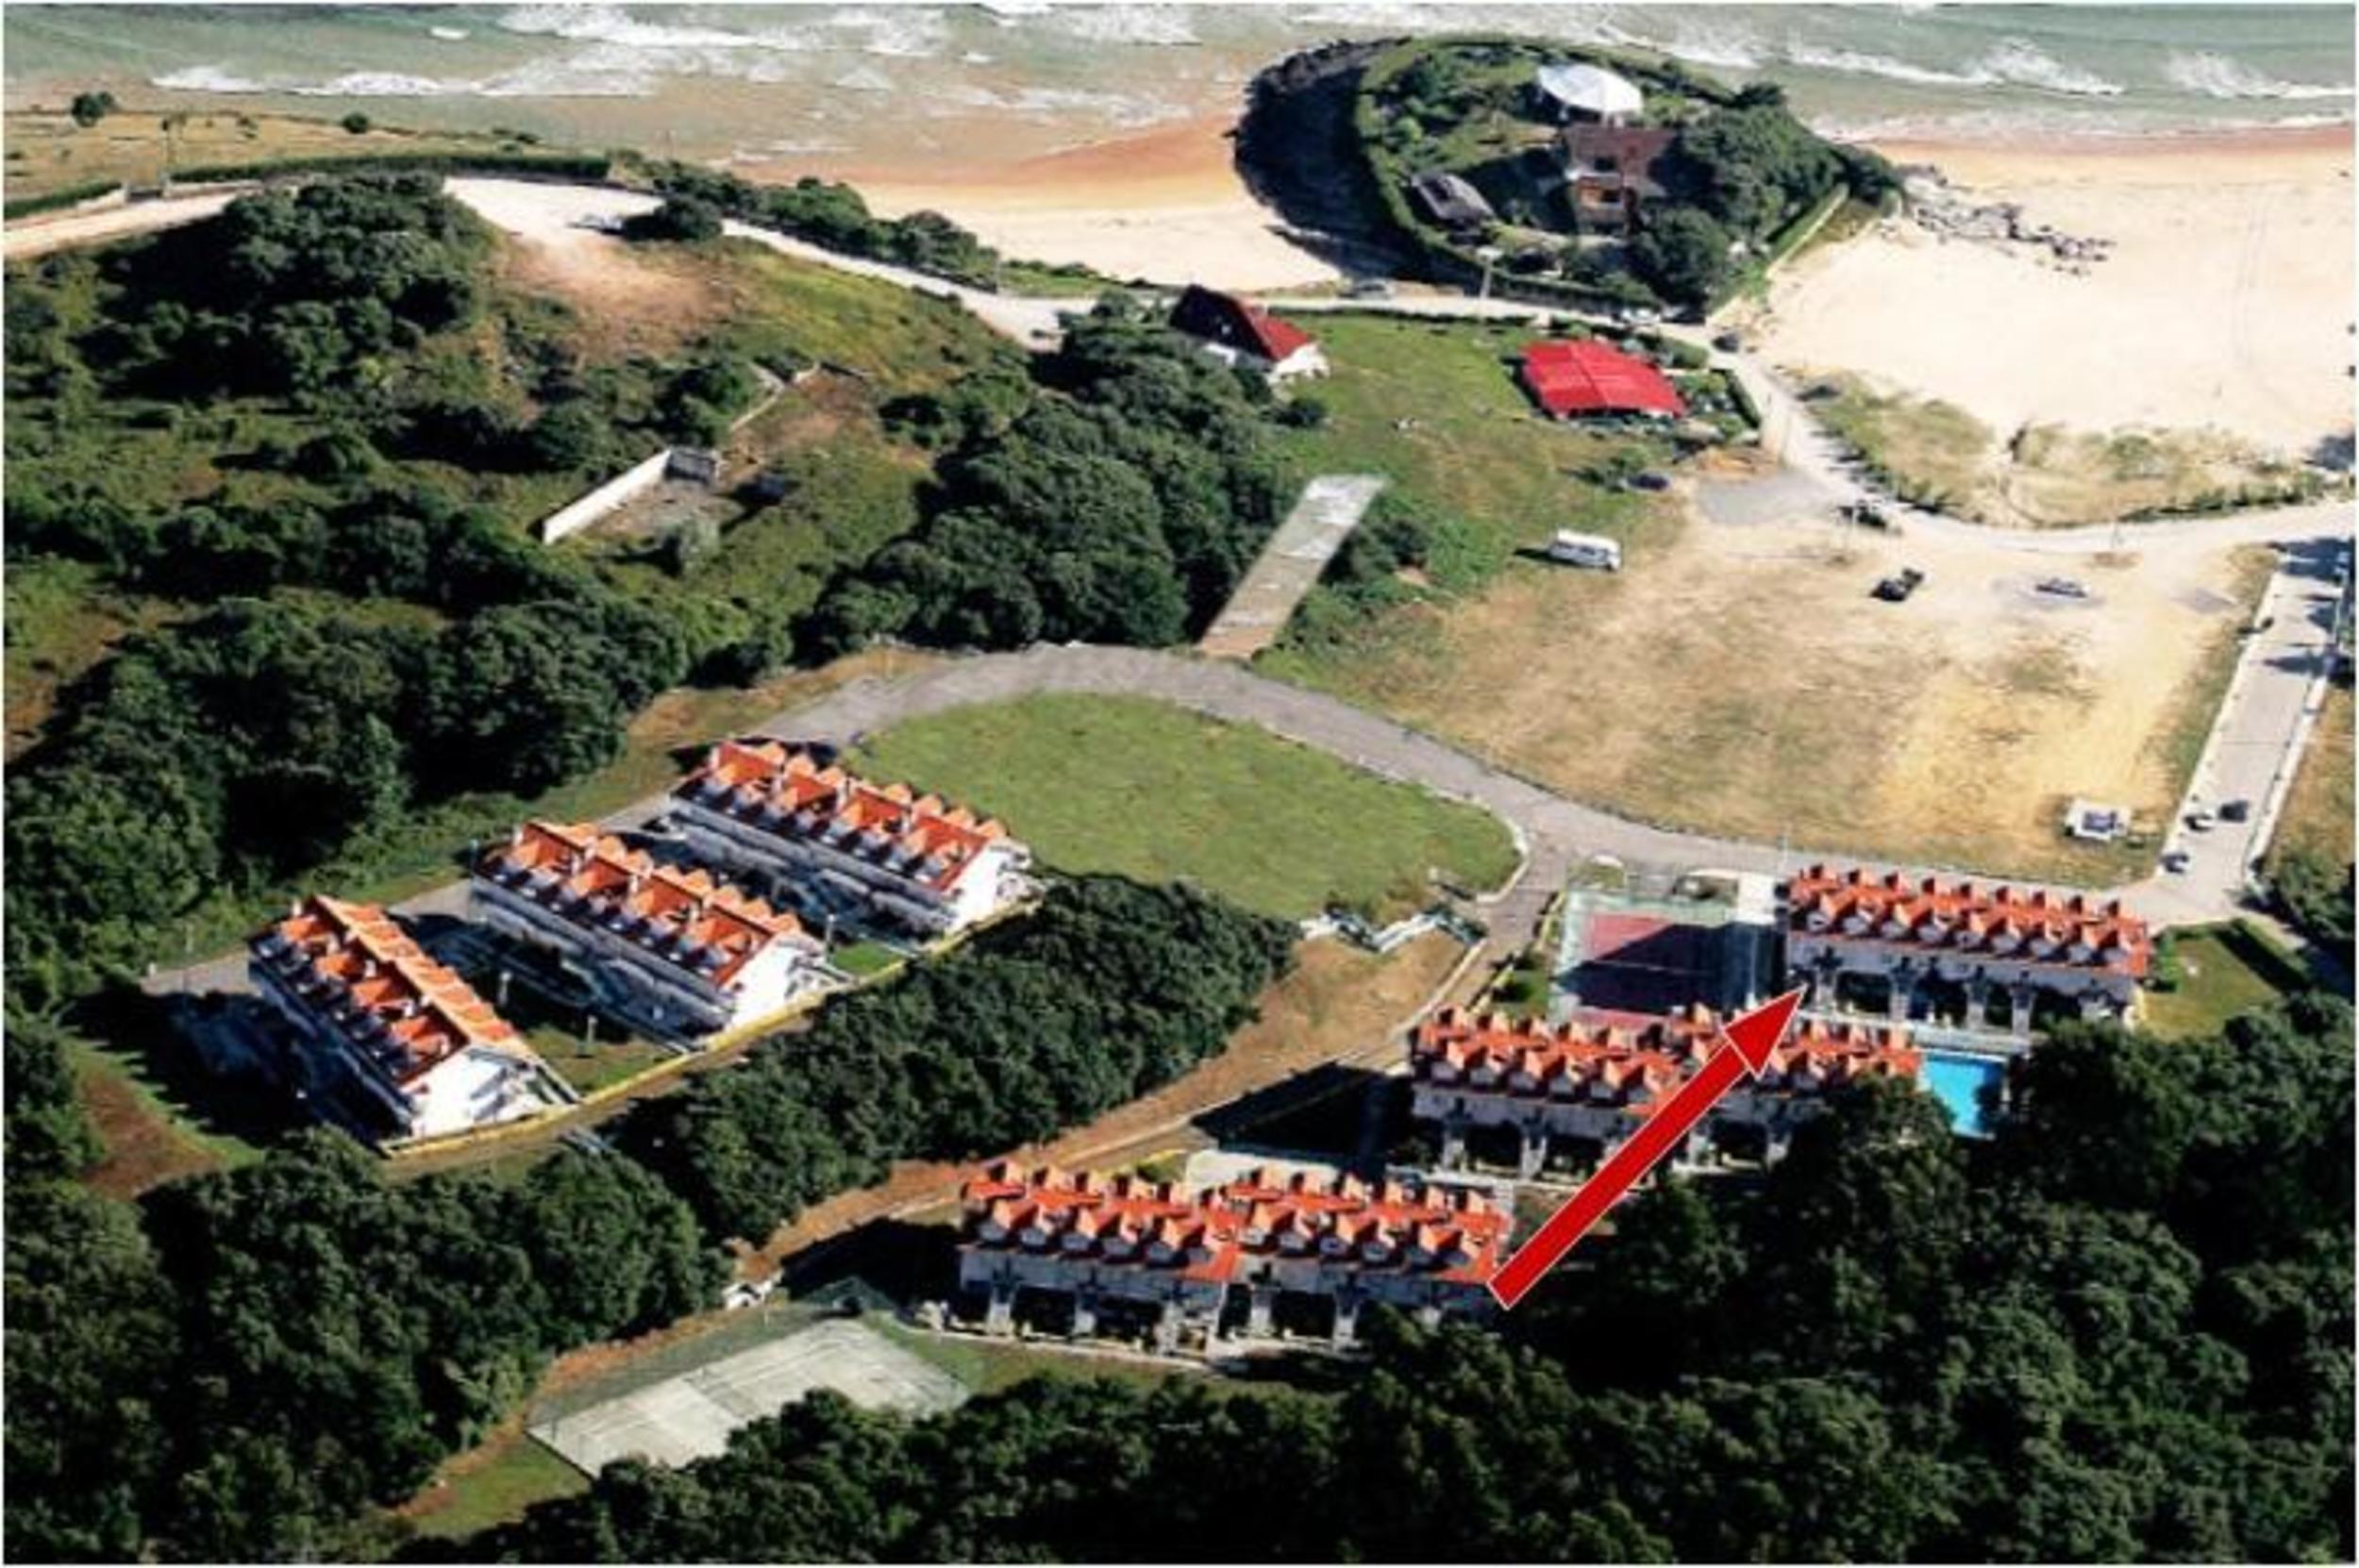 Ferienwohnung Apartment - 2 Bedrooms with Pool and Sea views - 102761 (2360861), Isla, Costa de Cantabria, Kantabrien, Spanien, Bild 5